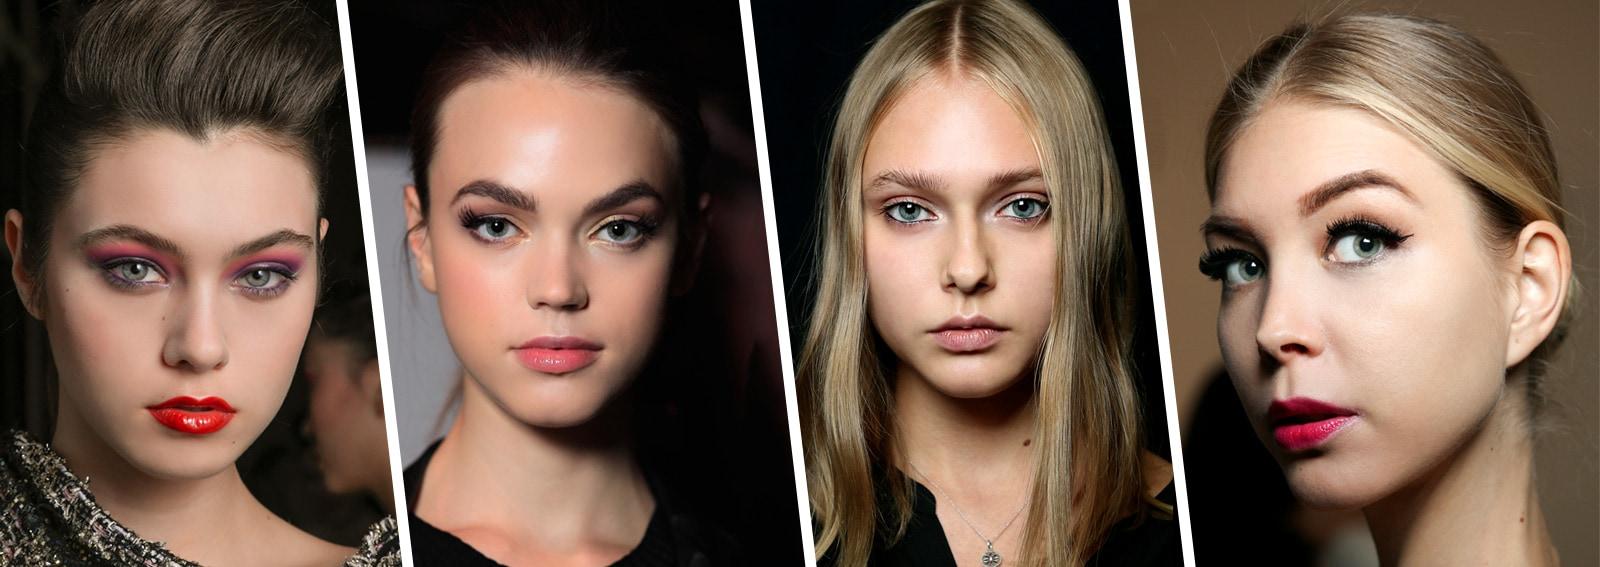 DESKTOP_make-up-occhi-verdi